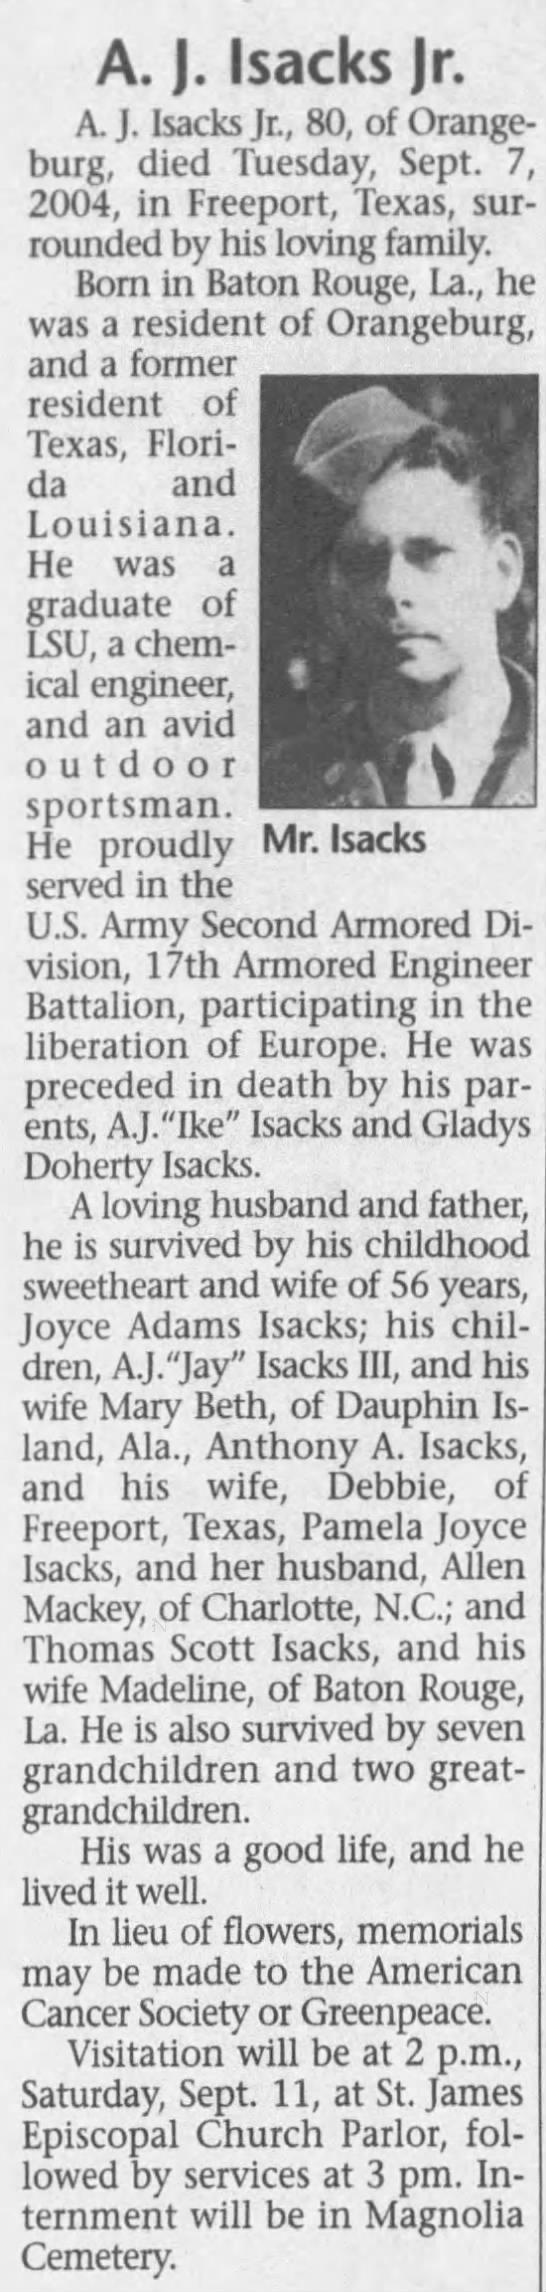 A. J. Isacks The Times and Democrat (Orangeburg, Orangeburg, South Carolina, United States of America) · 11 Sep 2004